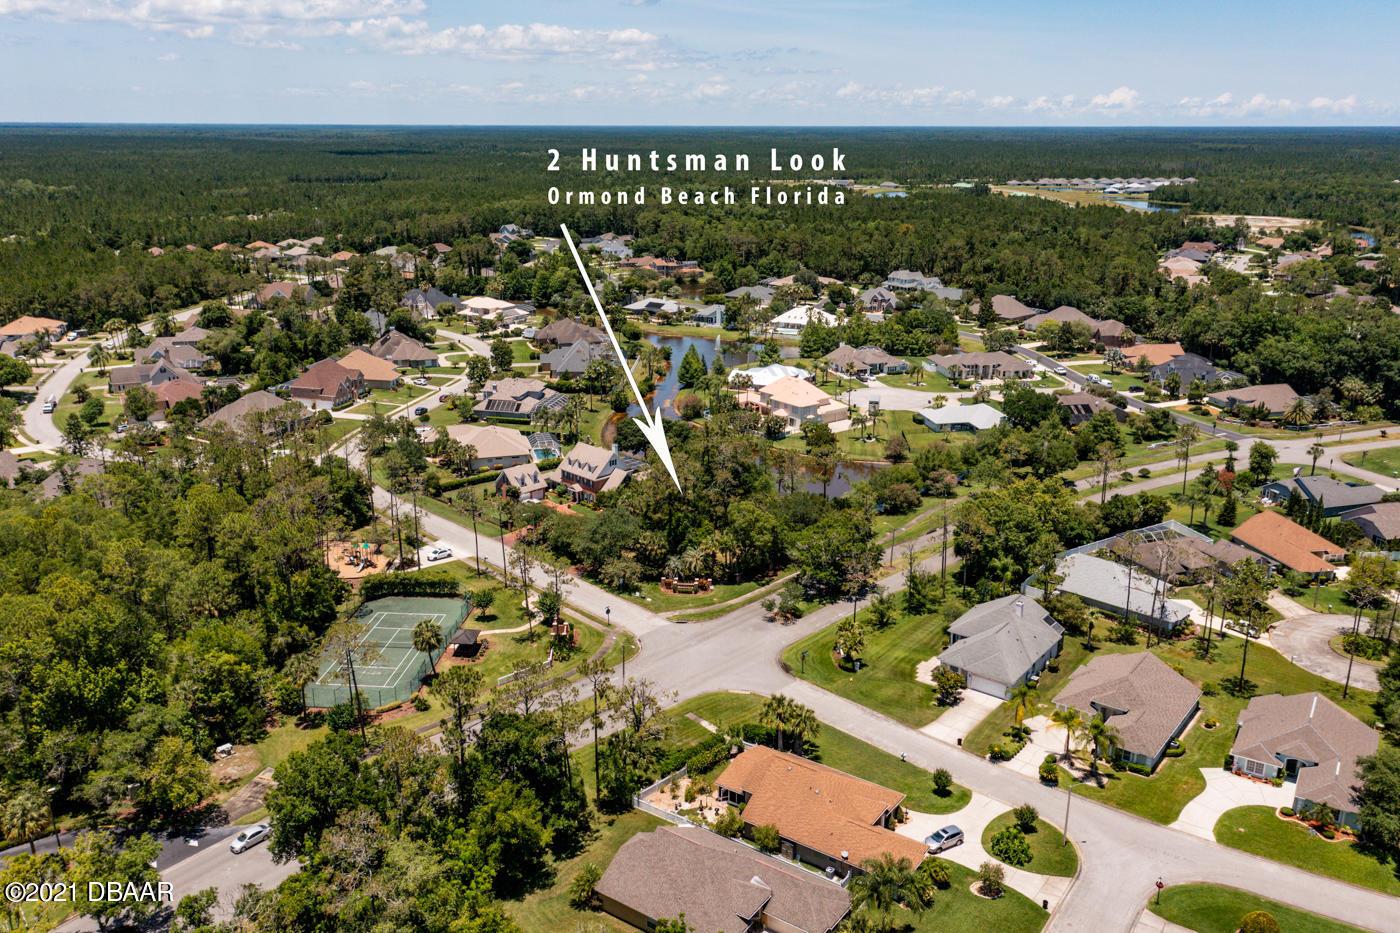 Photo of 2 Huntsman Look, Ormond Beach, FL 32174